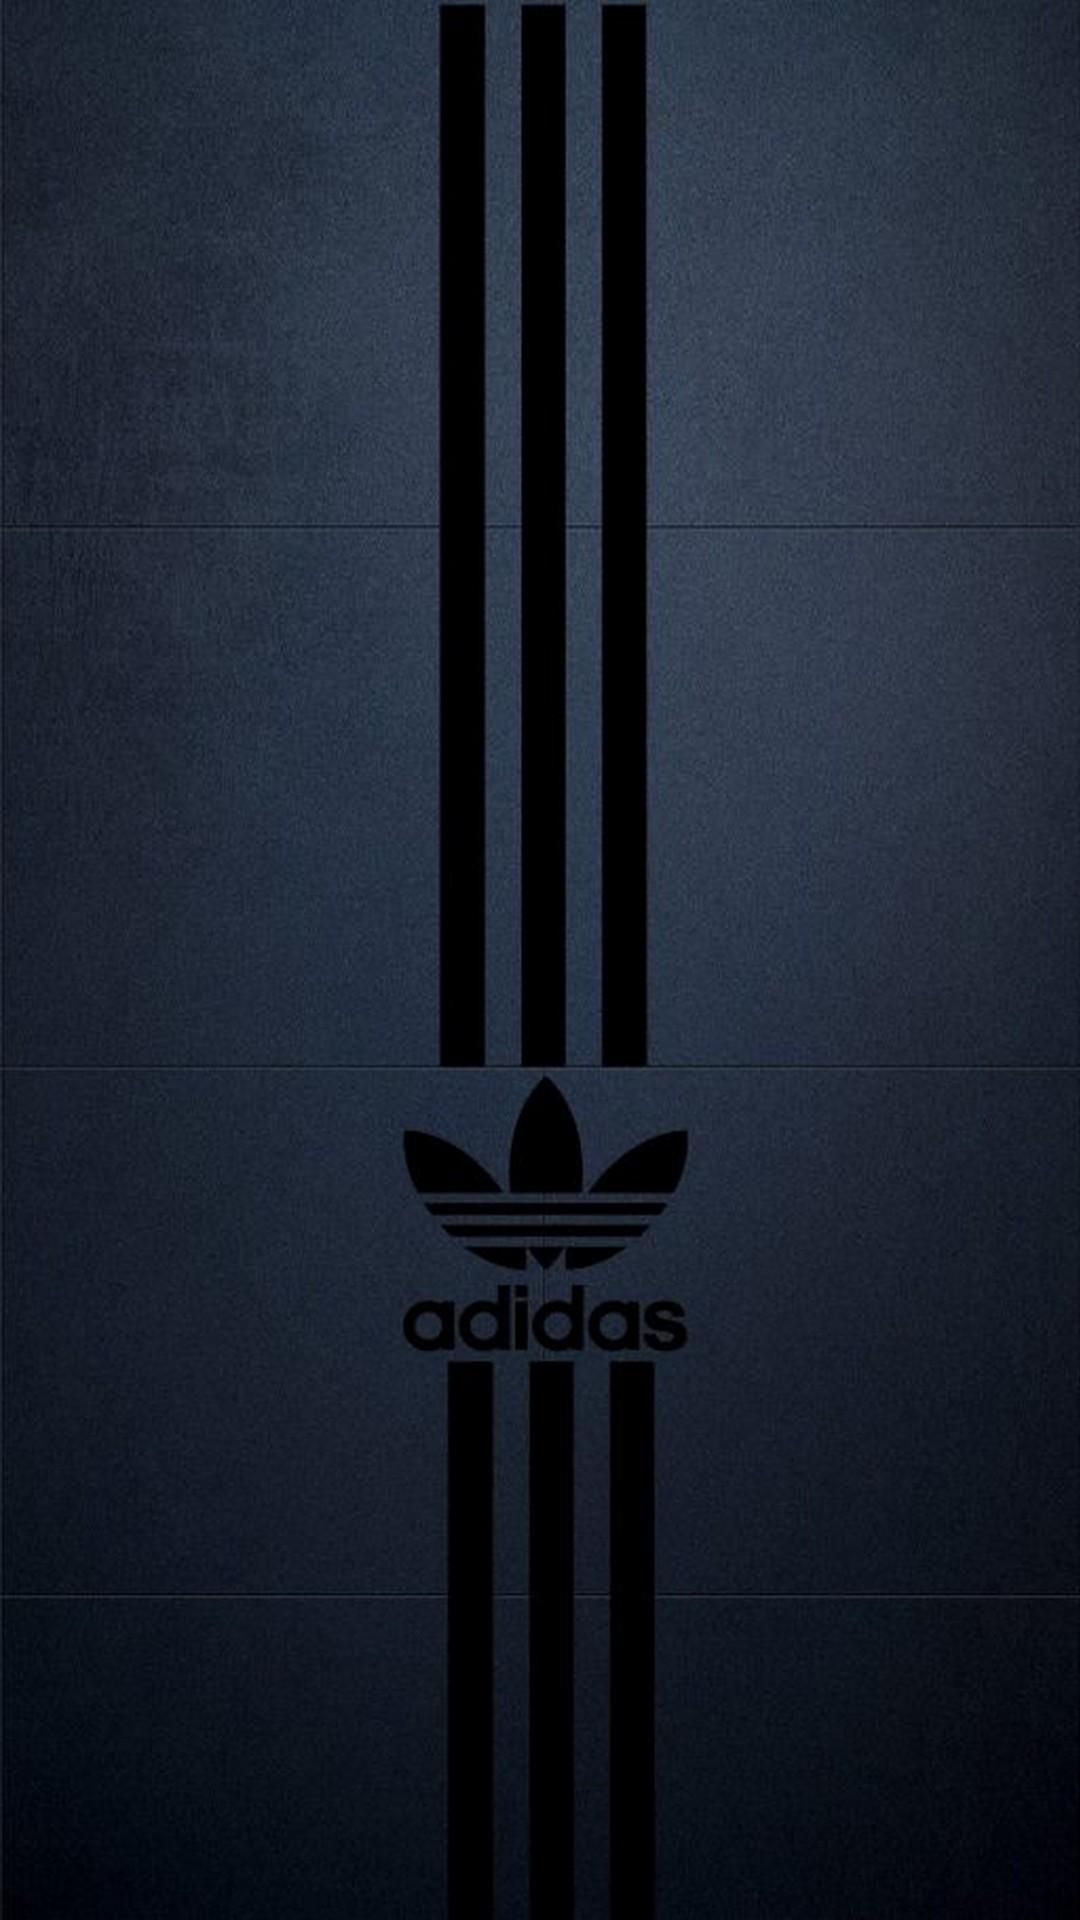 Wallpaper Iphone Adidas Off 63 Www Otuzaltinciparalel Com